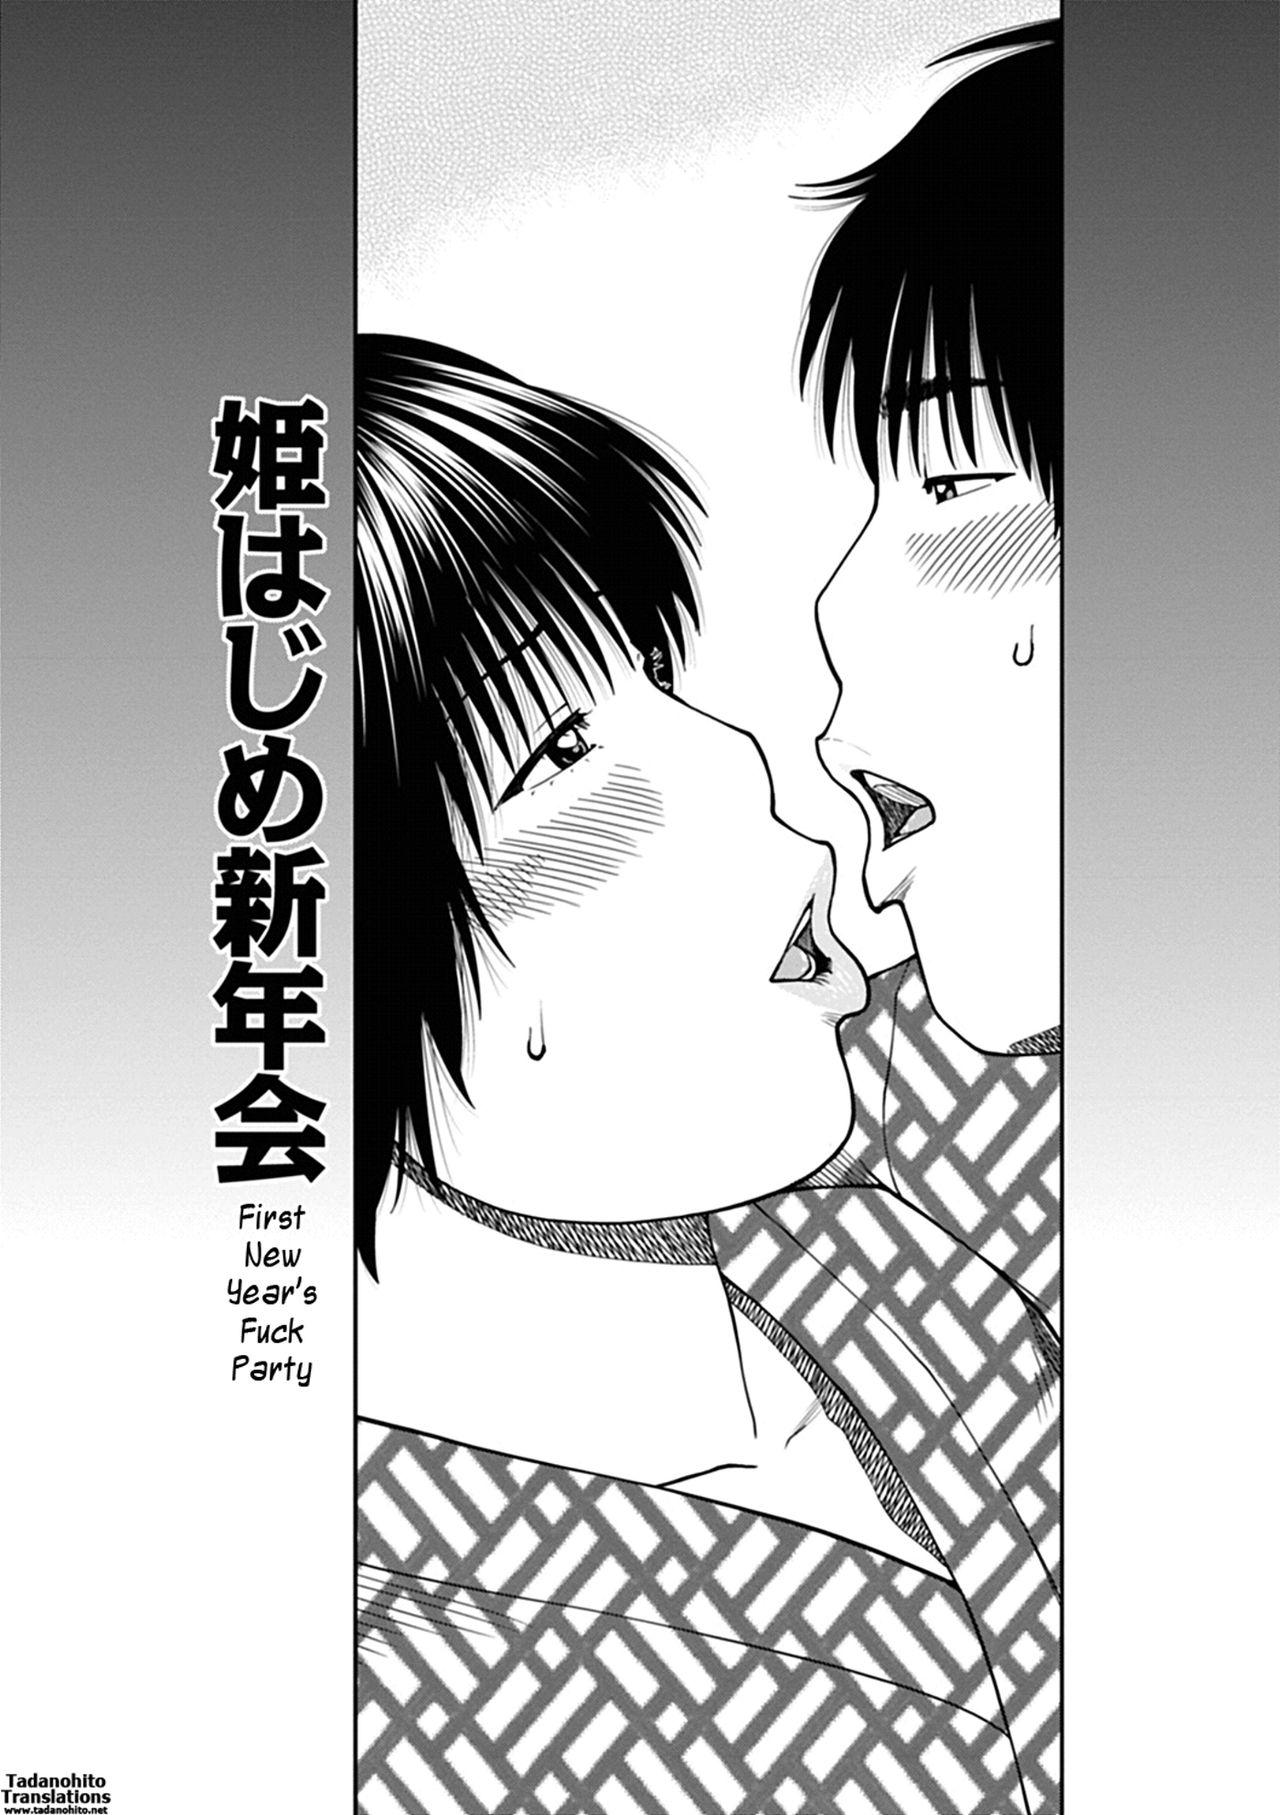 [Kuroki Hidehiko] 36-sai Injuku Sakarizuma | 36-Year-Old Randy Mature Wife [English] {Tadanohito} [Digital] [Uncensored] 173